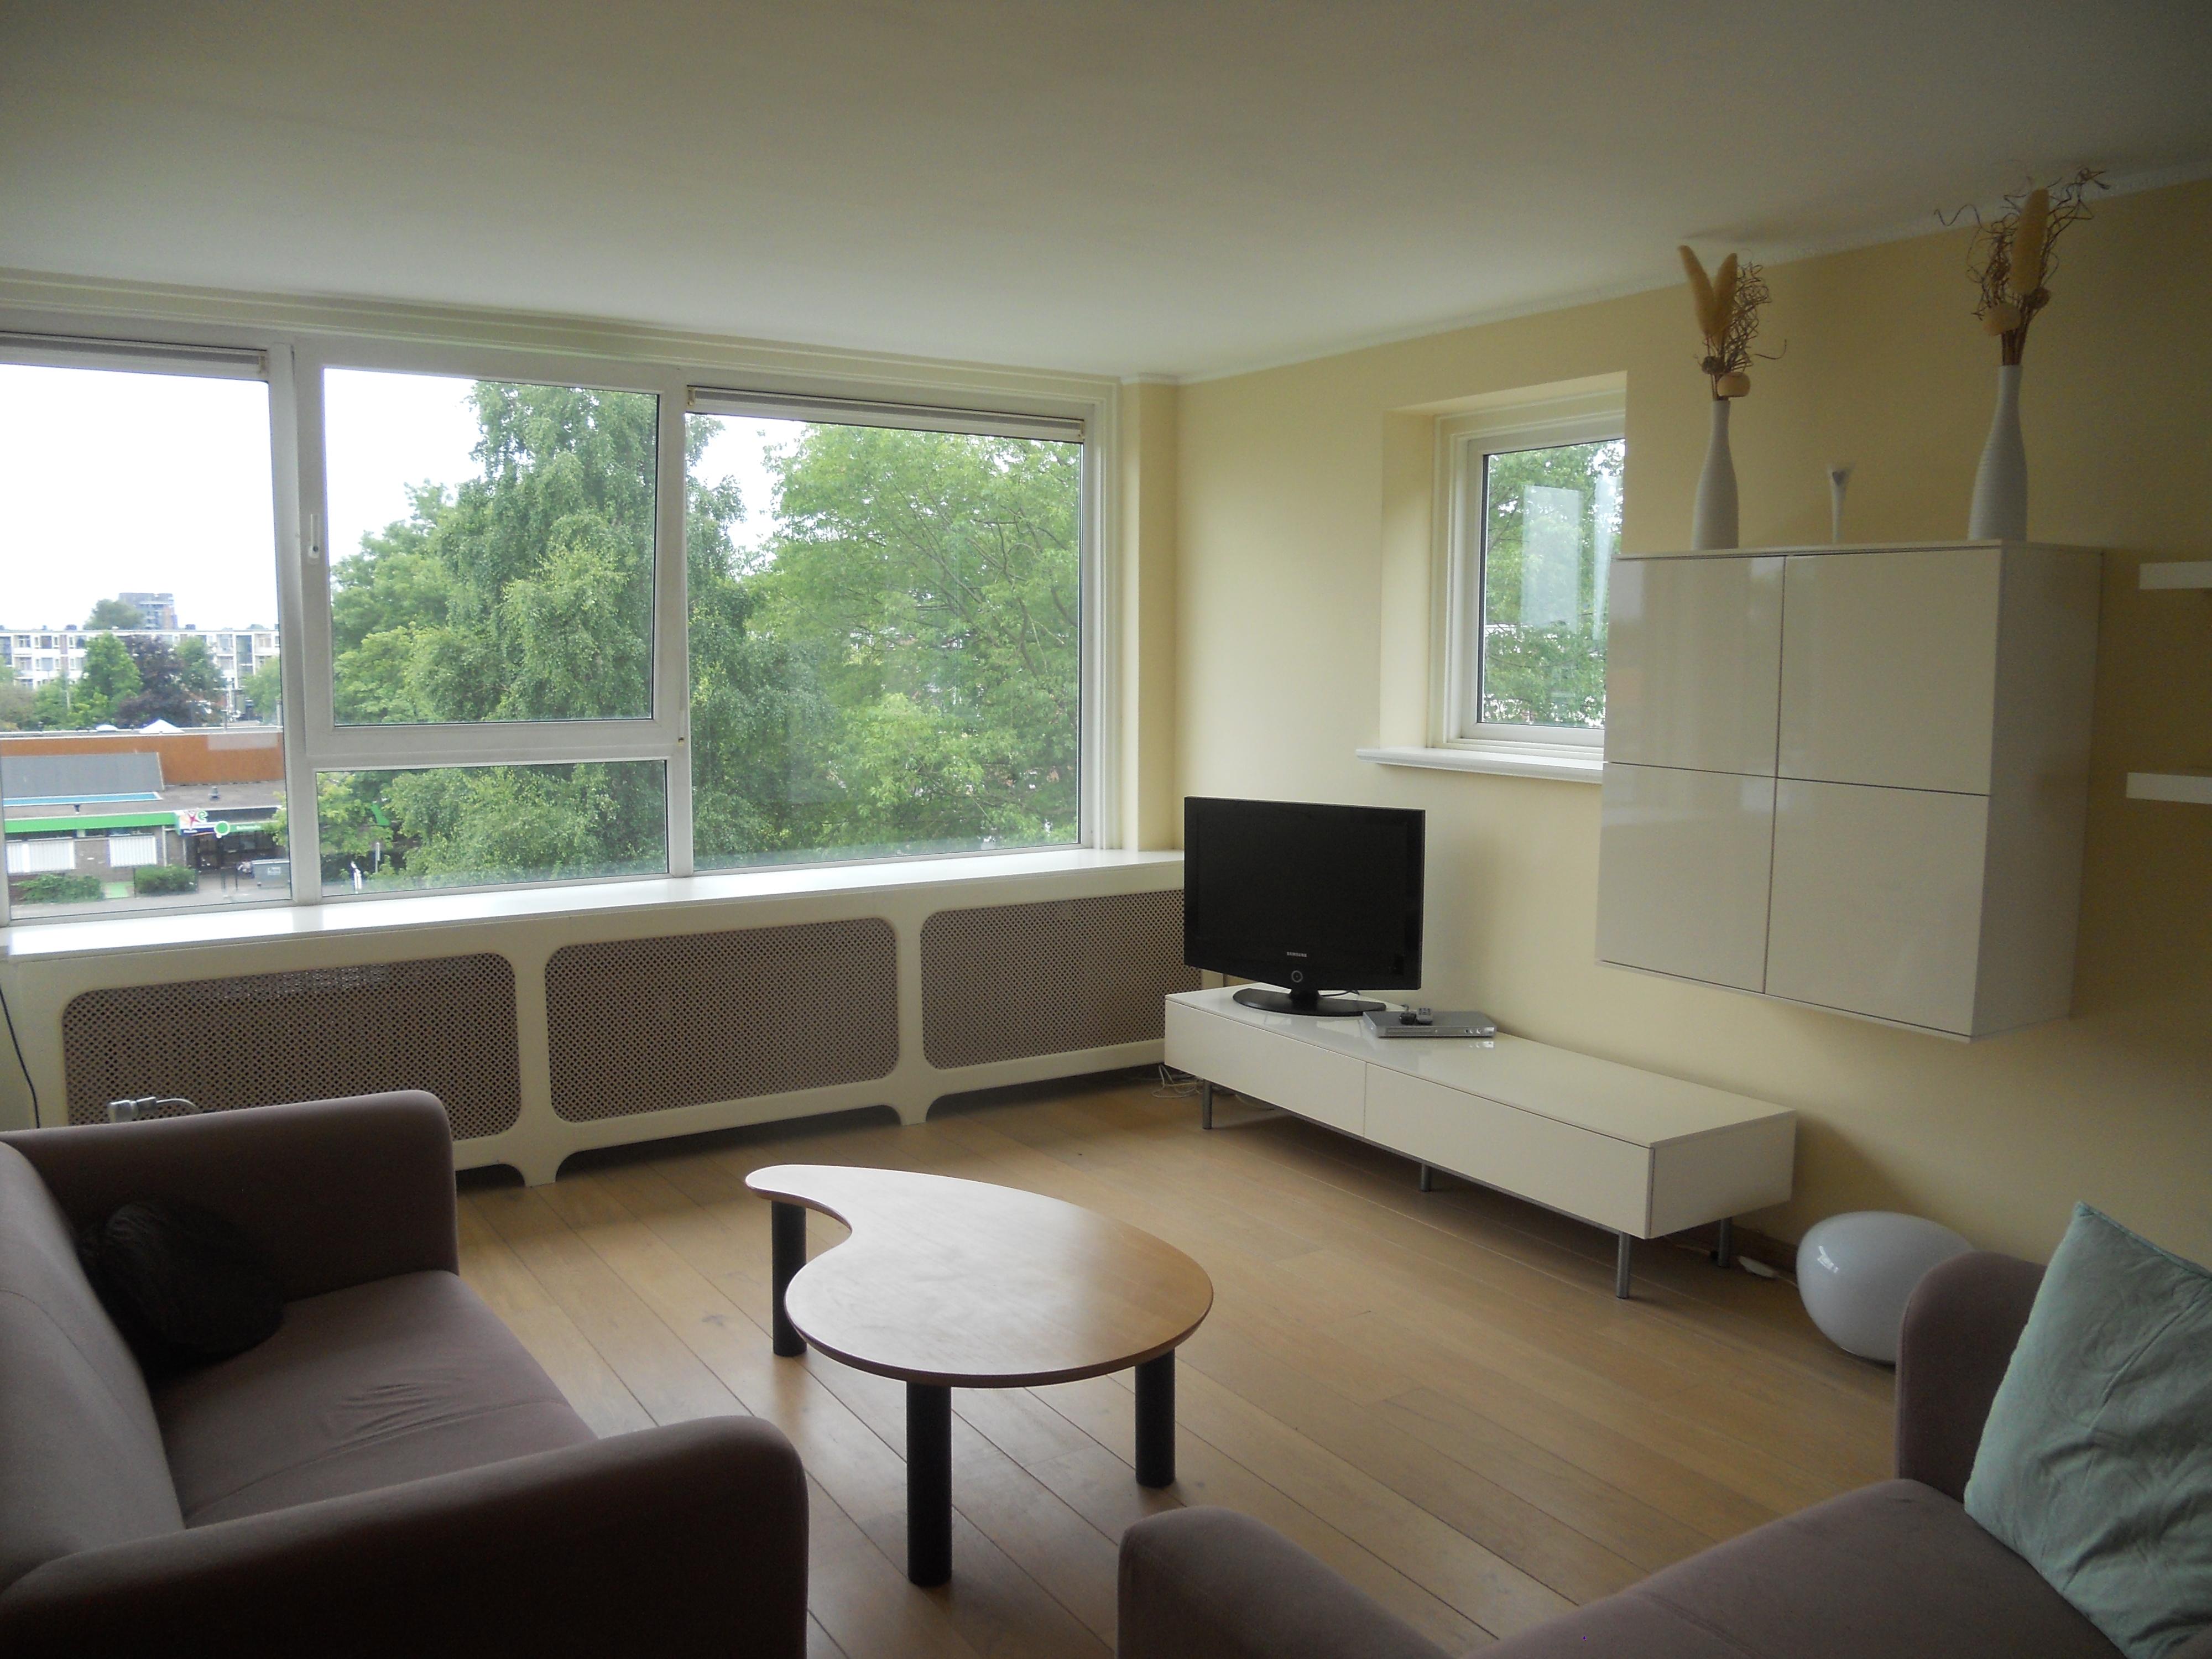 For Rent 2017 2 Bedroom Apartment Near The University Of Twente Twents V